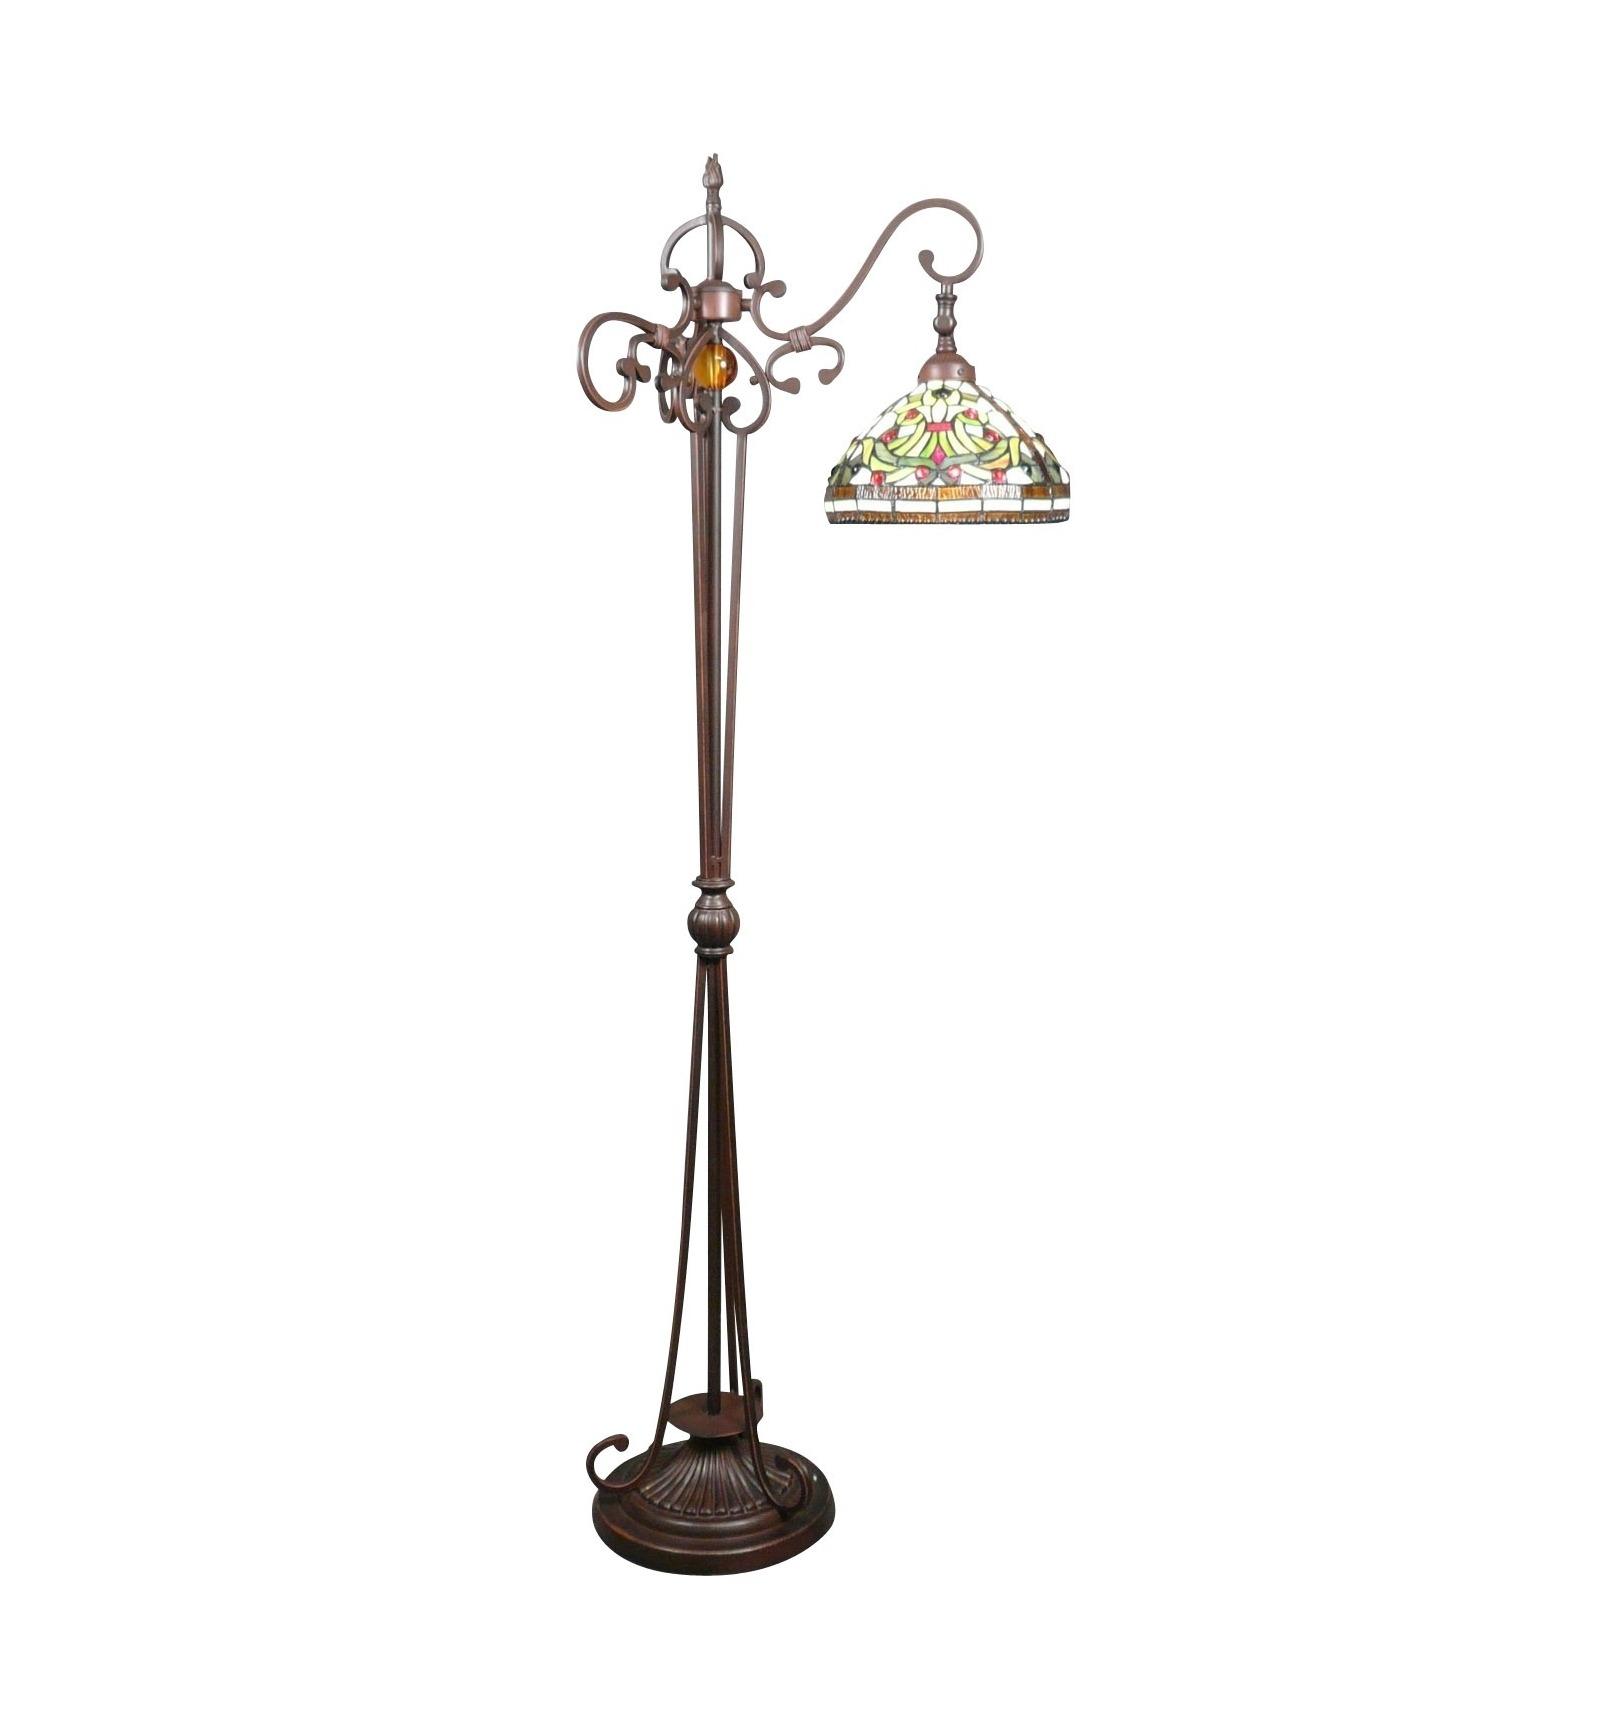 Tiffany floor lamp set indiana statues art deco furniture for Vesta tiffany floor lamp